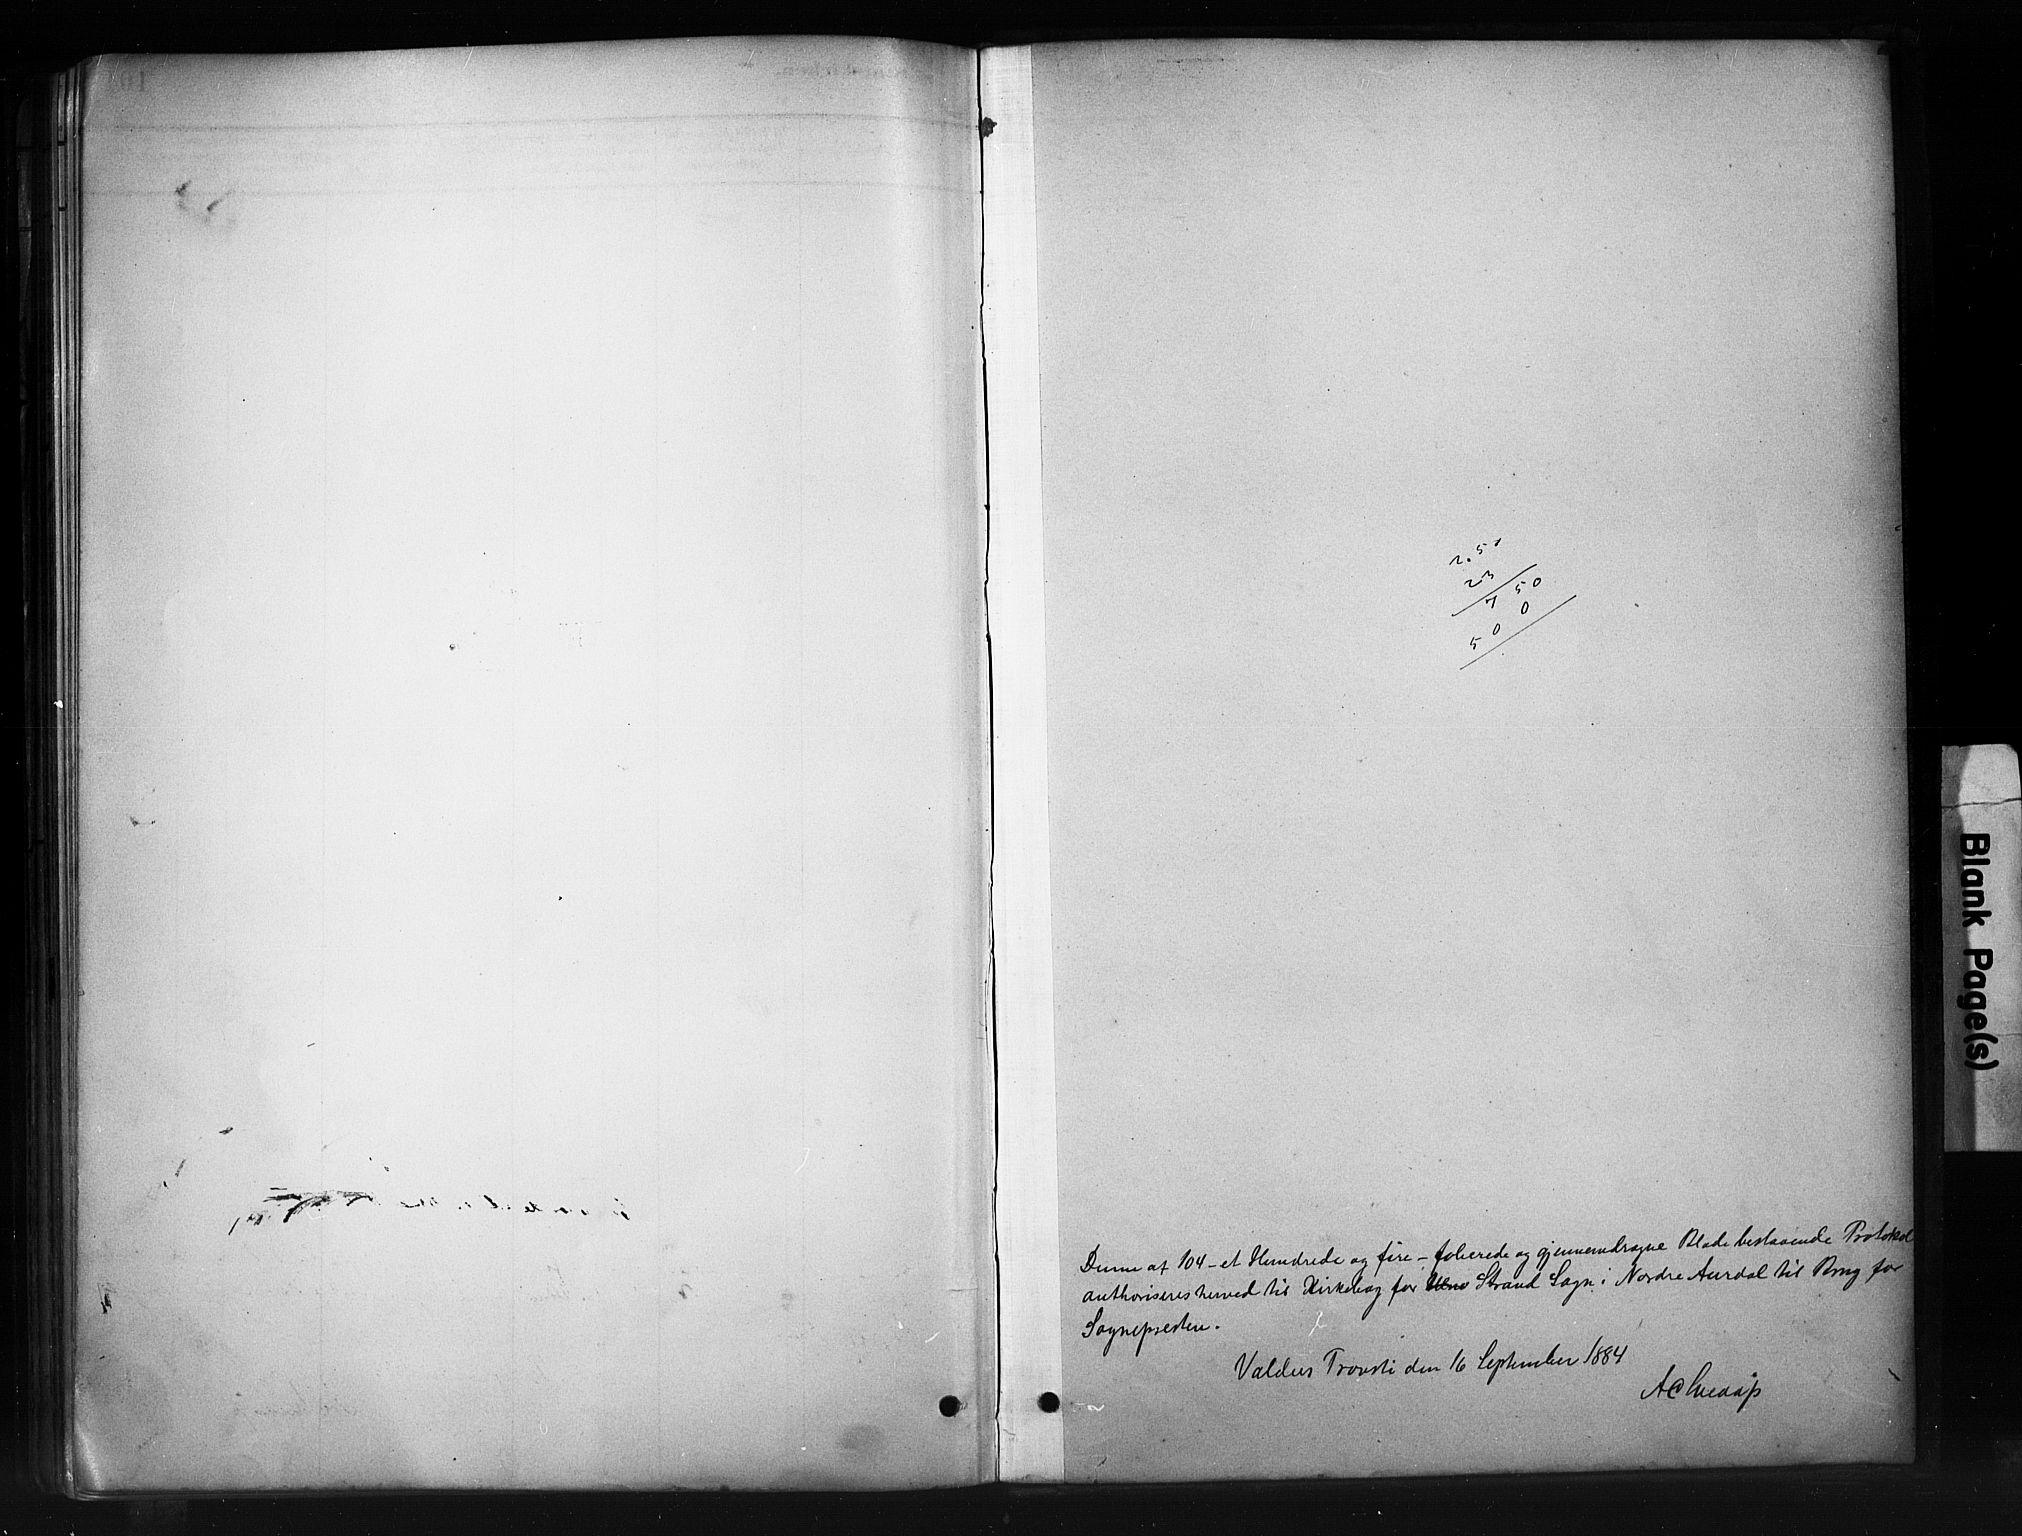 SAH, Nord-Aurdal prestekontor, Ministerialbok nr. 10, 1883-1896